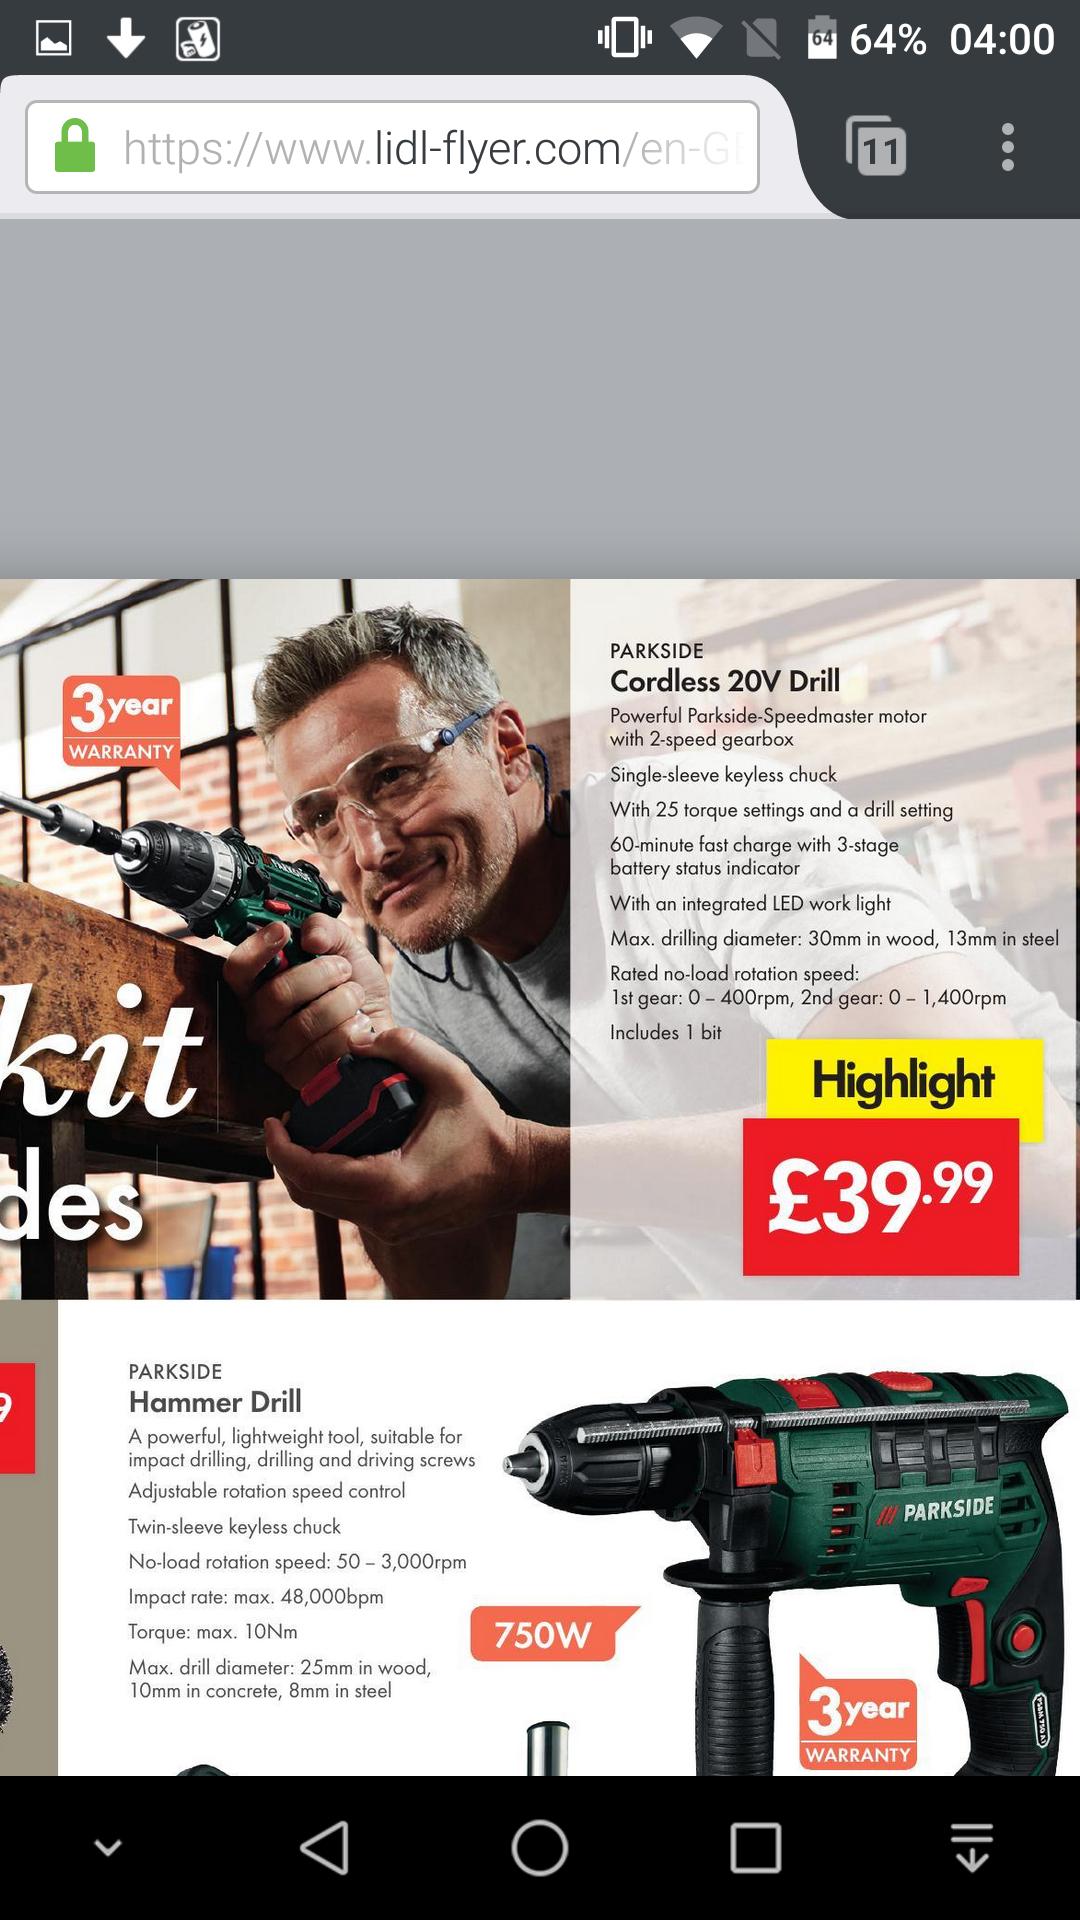 Parkside 20 volt cordless drill £39.99 @ lidl